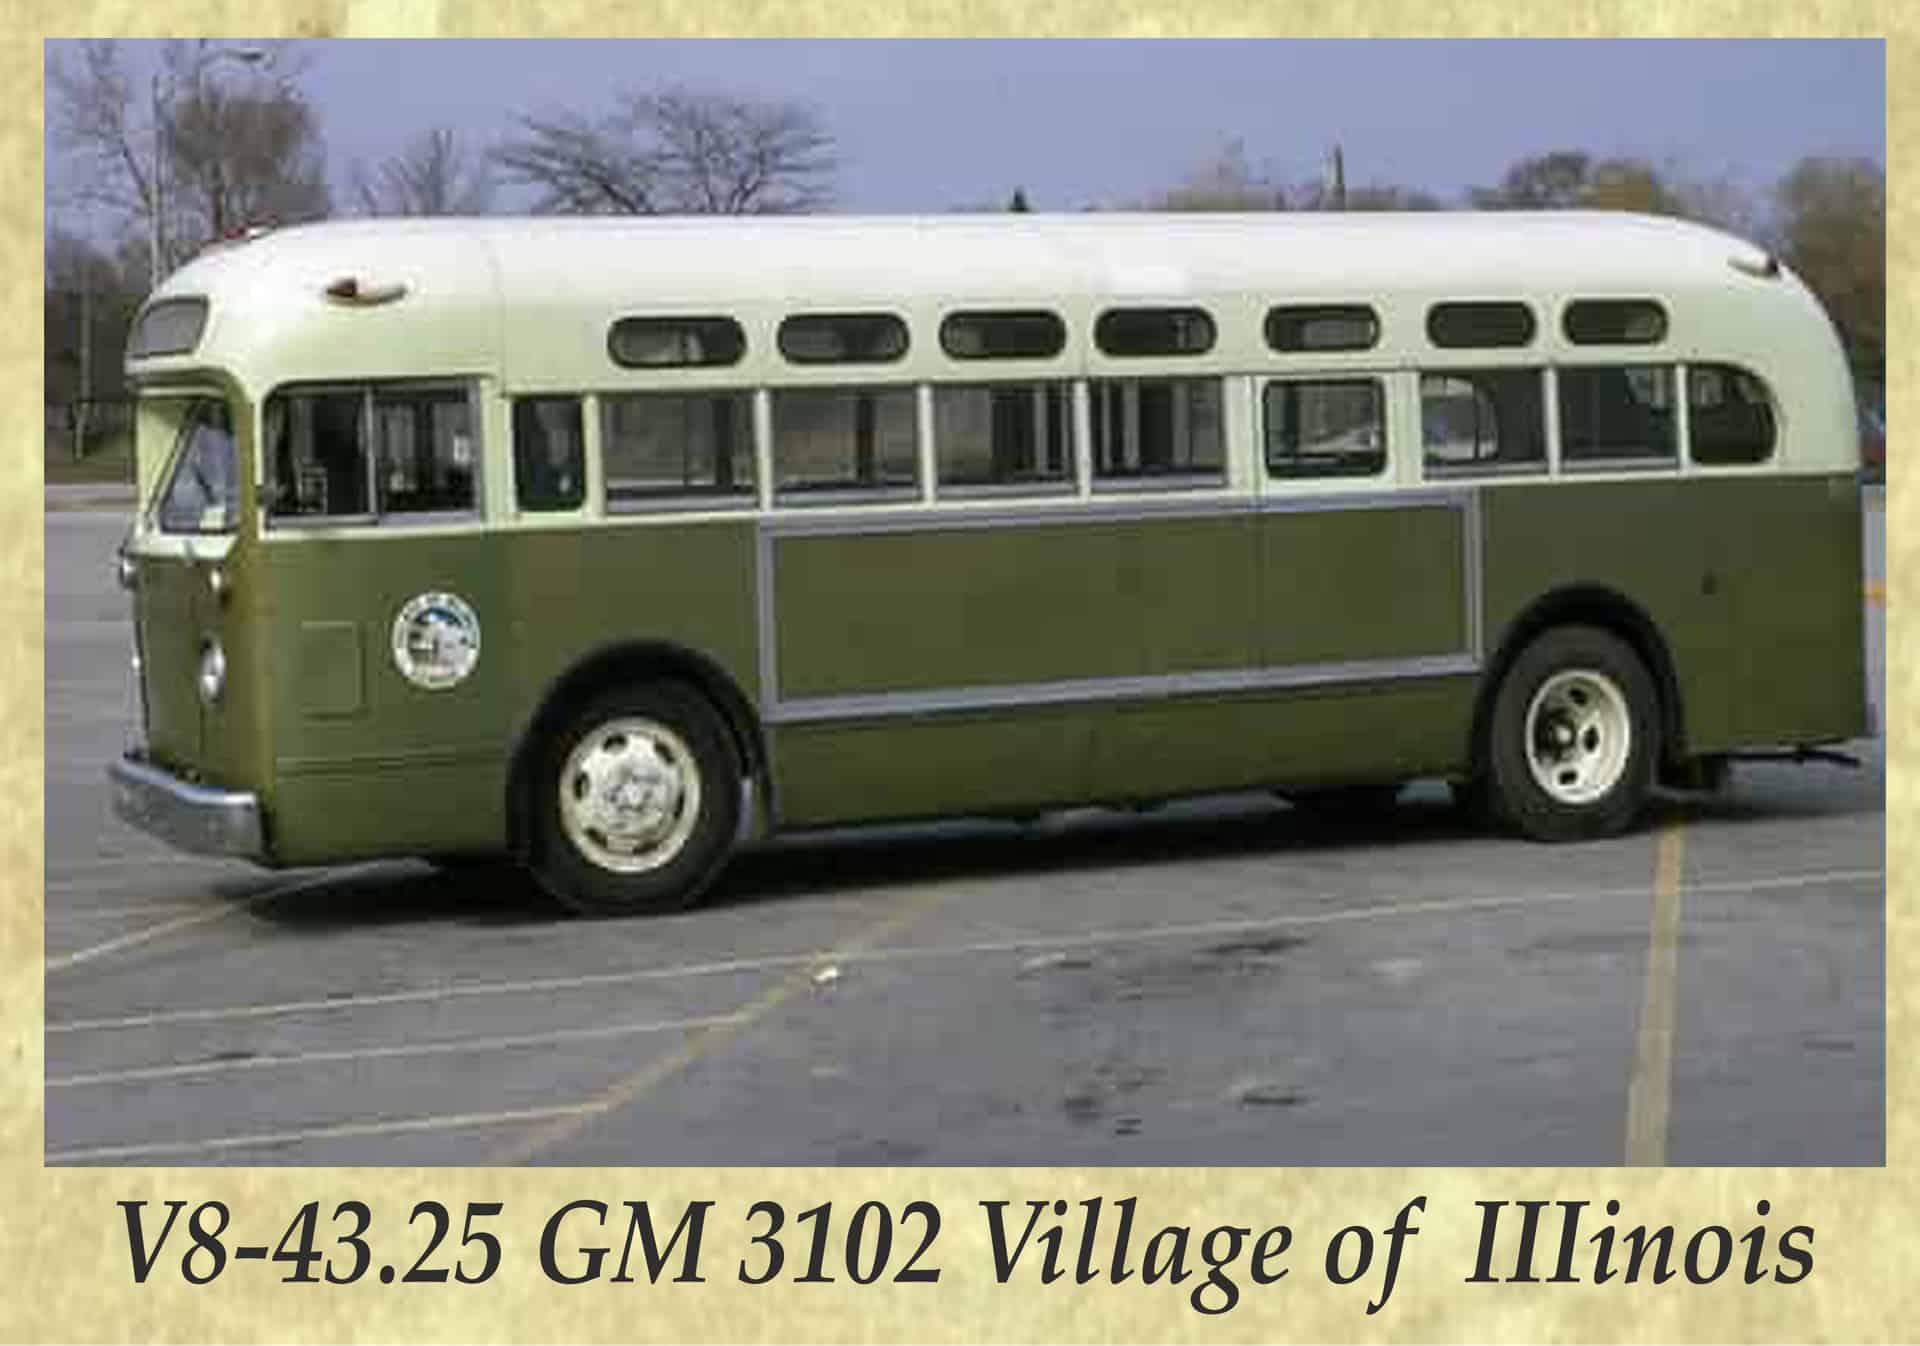 V8-43.25 GM 3102 Village of IIIinois